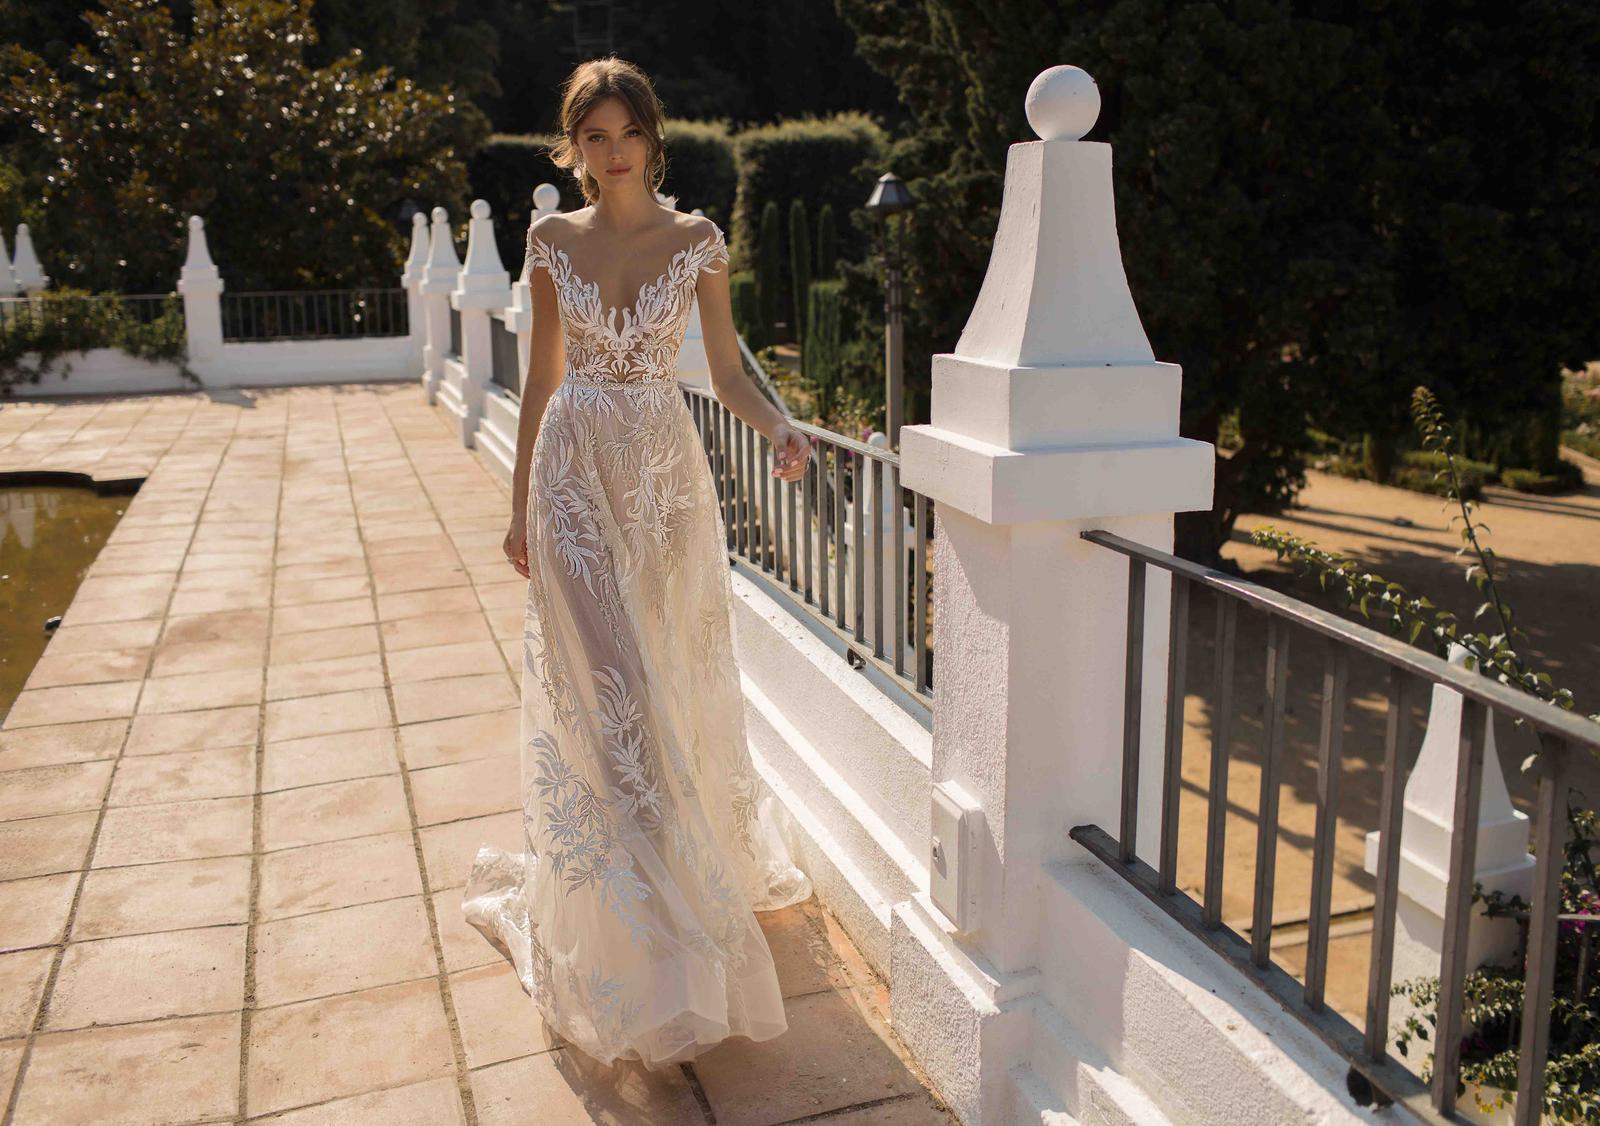 Muse by Berta * Svadobné šaty z kolekcií na rok 2019 - Obrázok č. 20